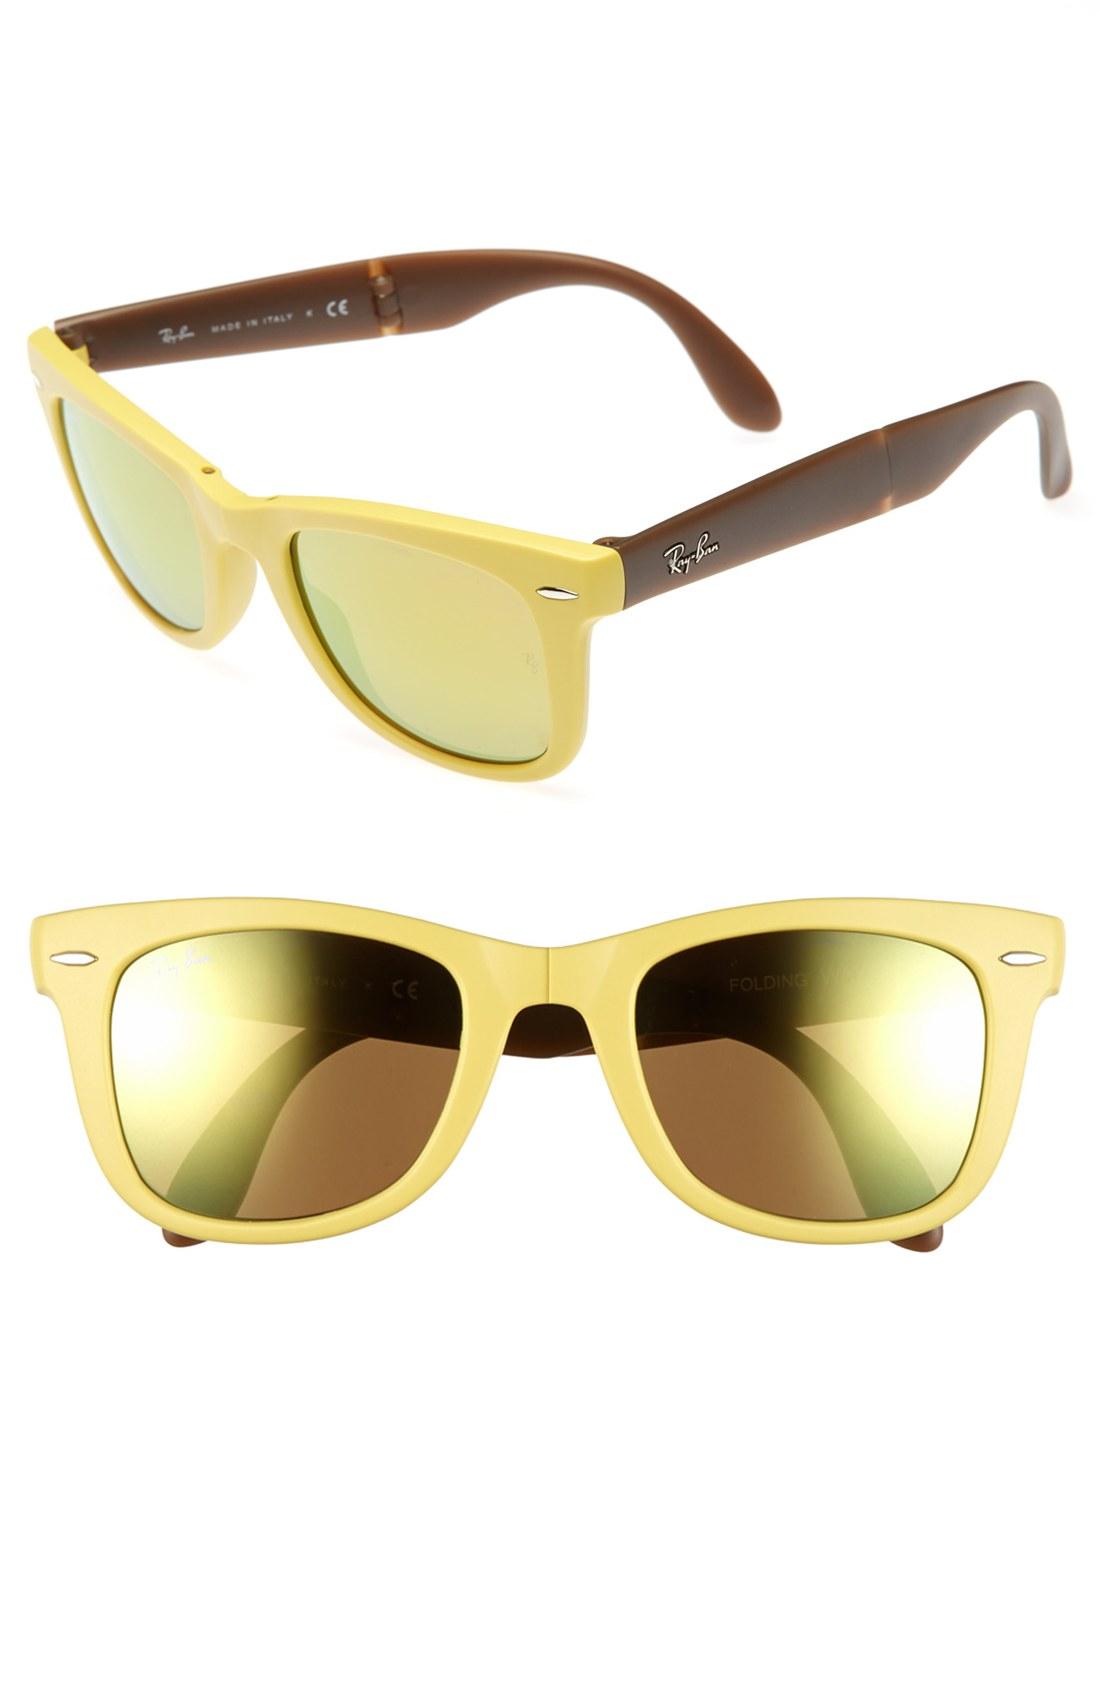 ray ban folding wayfarer 50mm sunglasses in khaki matte yellow lyst. Black Bedroom Furniture Sets. Home Design Ideas